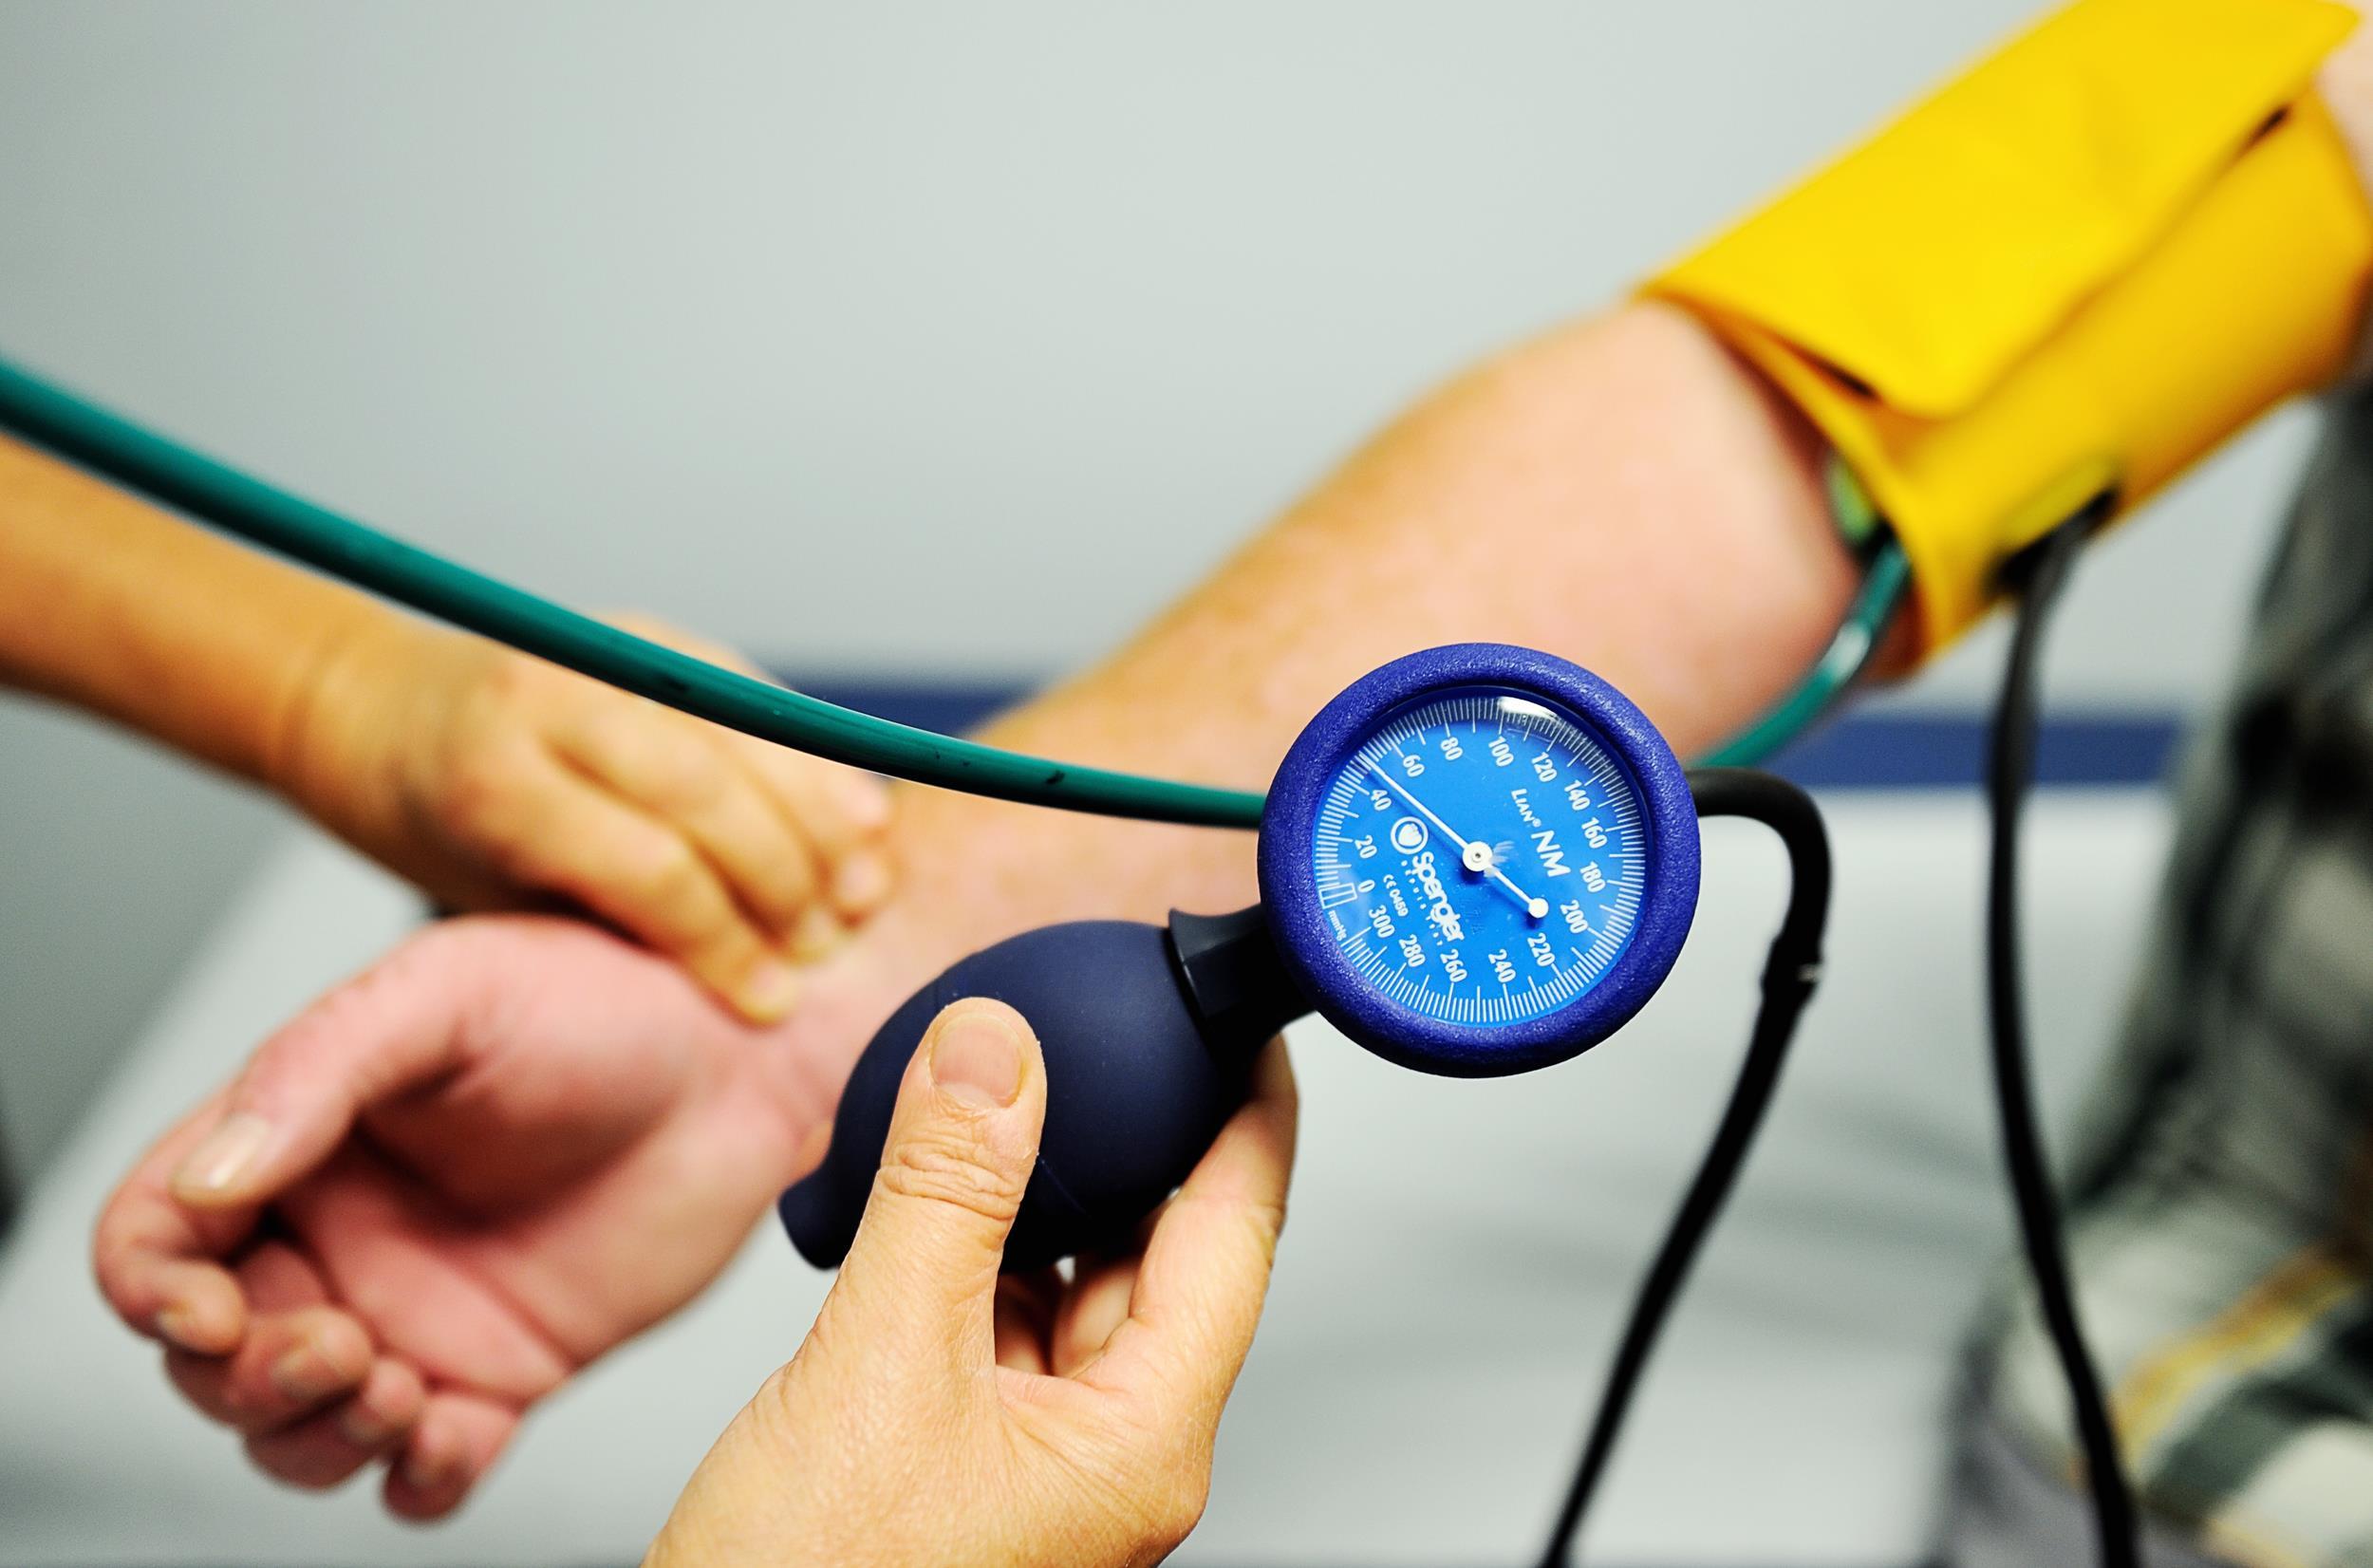 Image: A nurse measures the blood pressure of a patient.